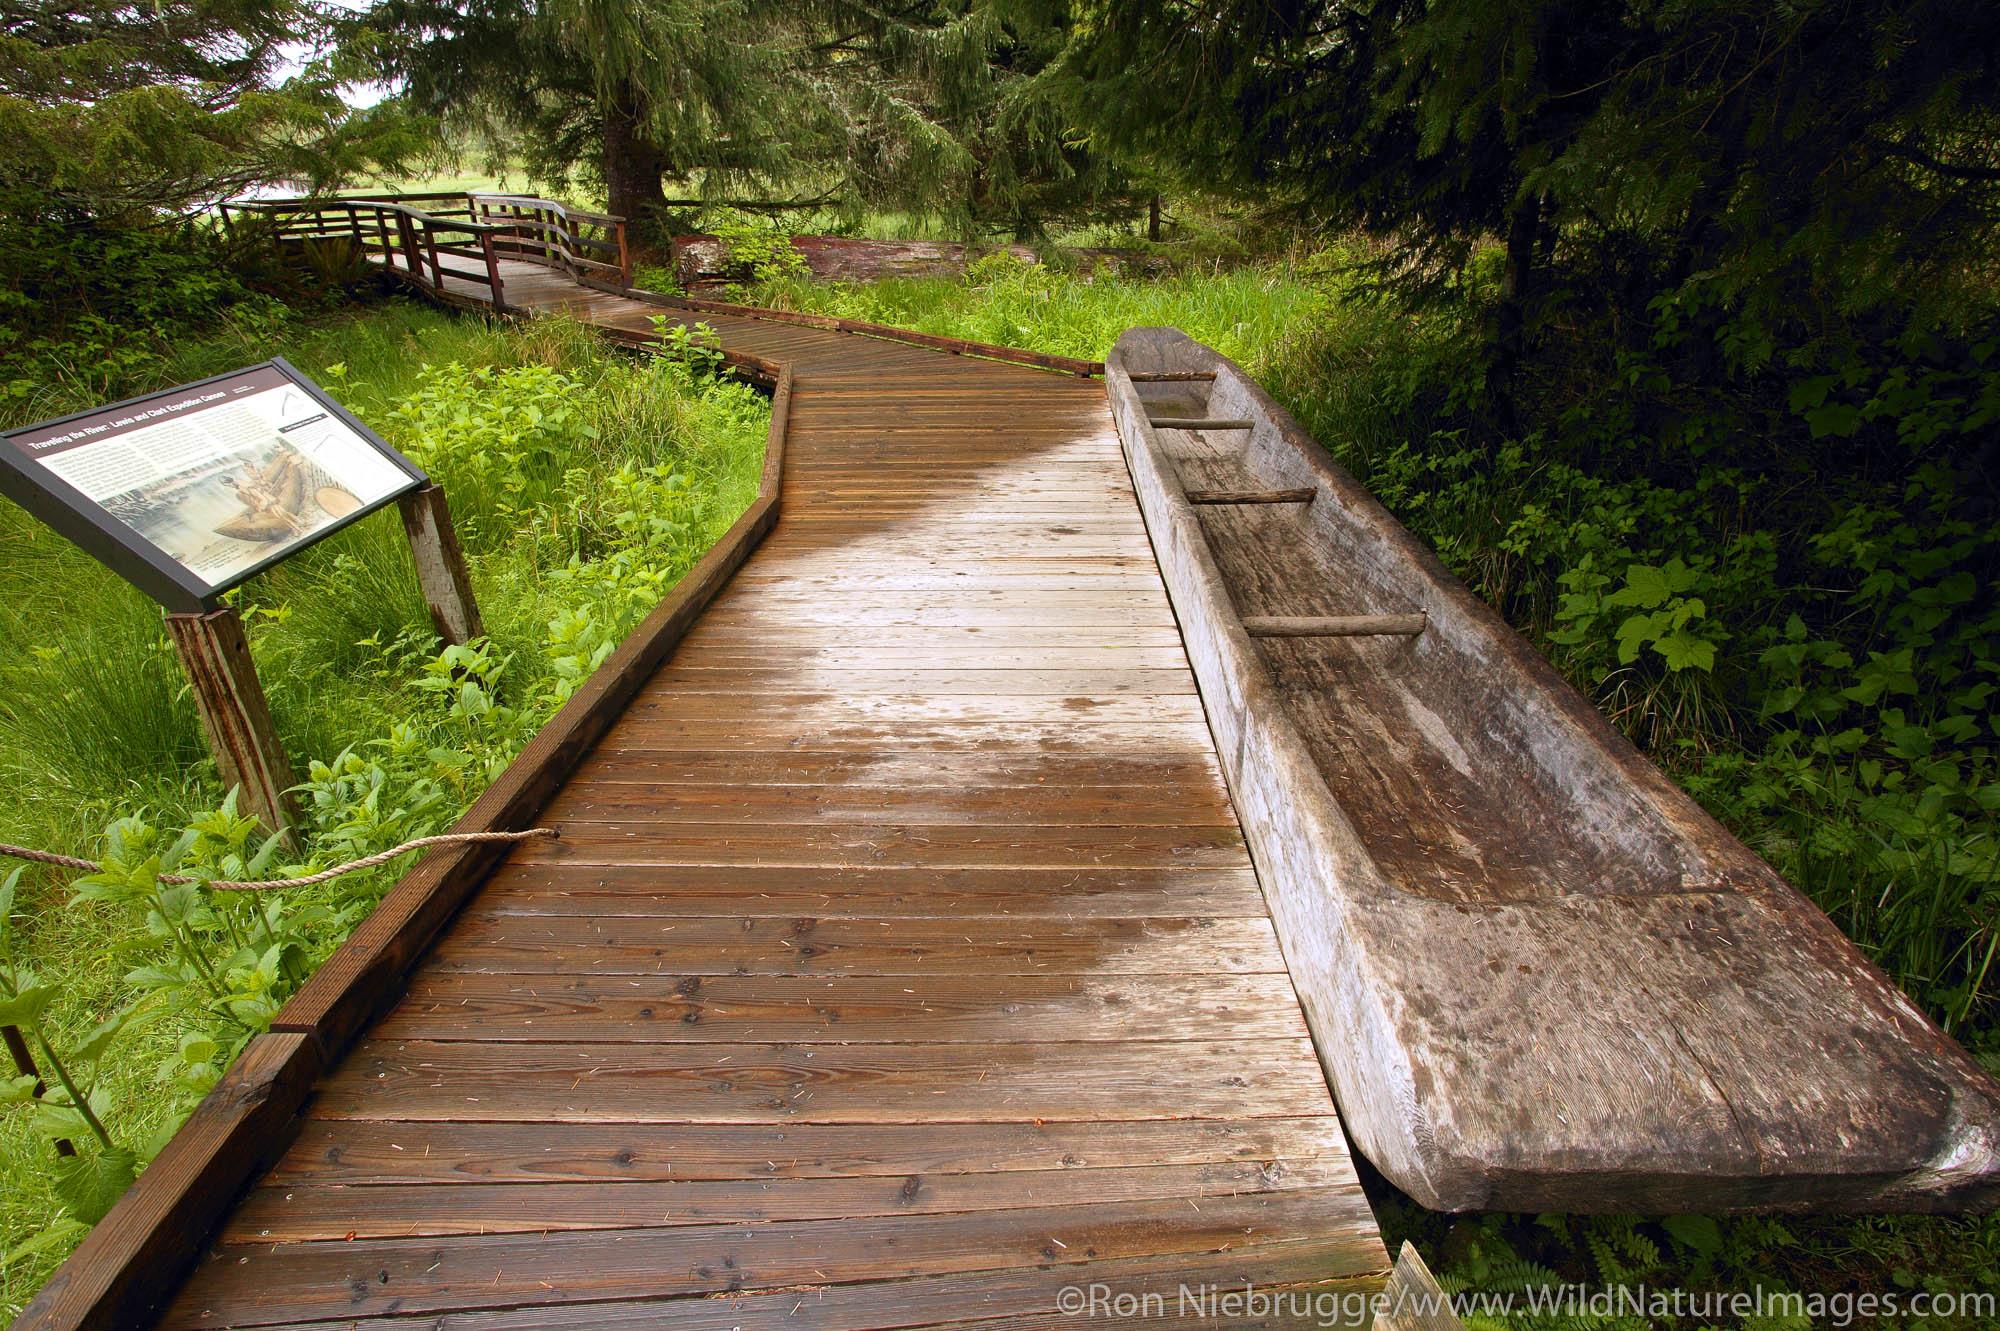 Canoe landing, Fort Clatsop National Memorial, near Astoria, Oregon.